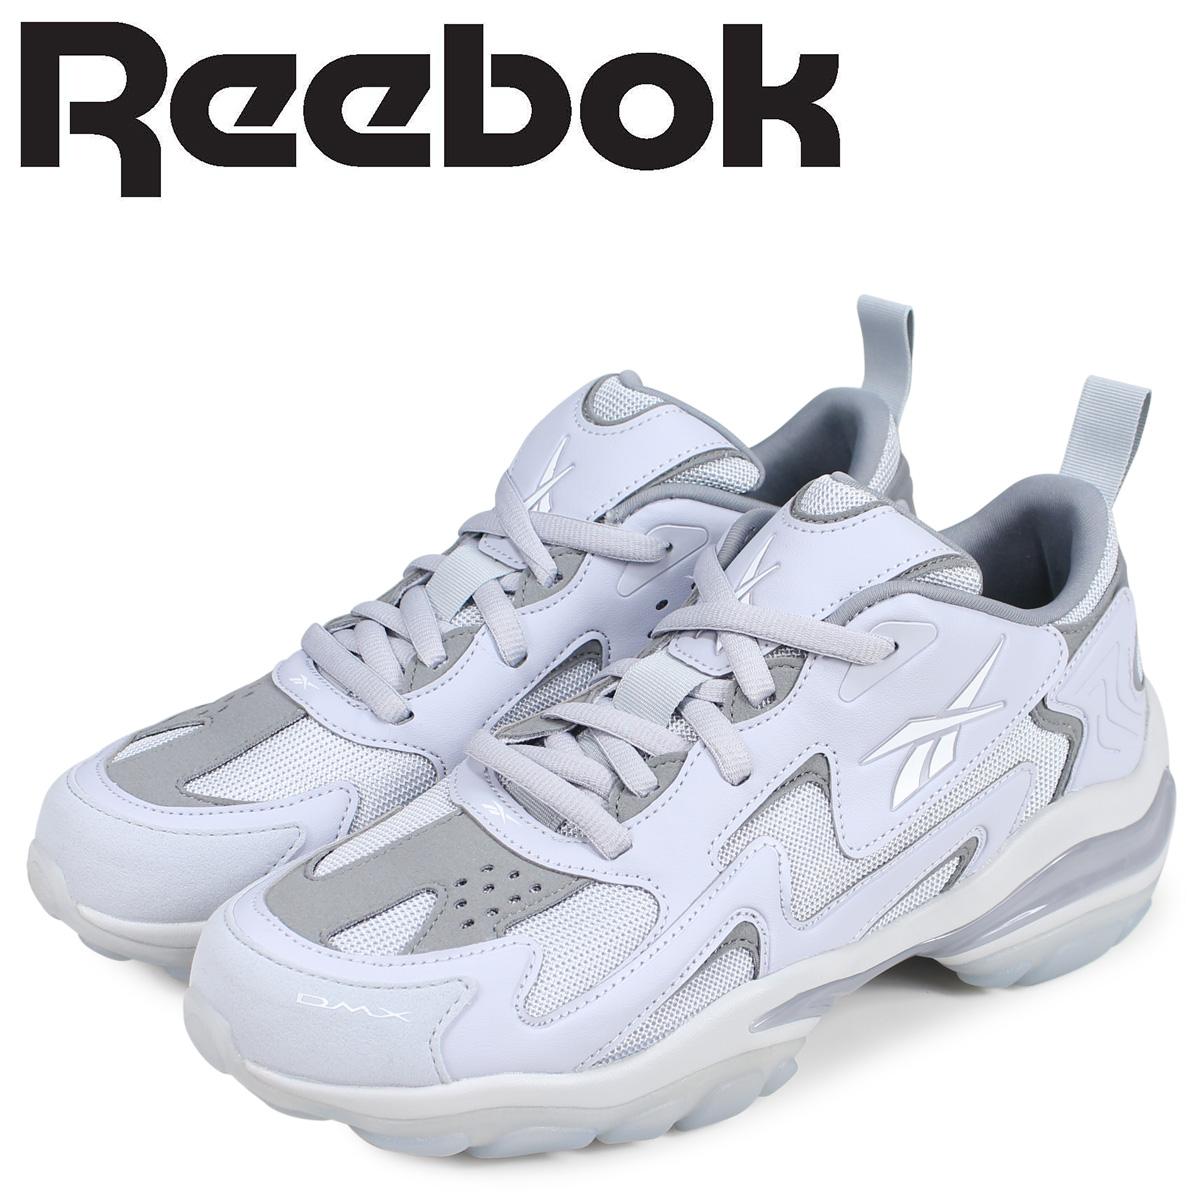 Reebok リーボック ディエムエックスシリーズ 1600 スニーカー メンズ DMX SERIES 1600 グレー DV5562